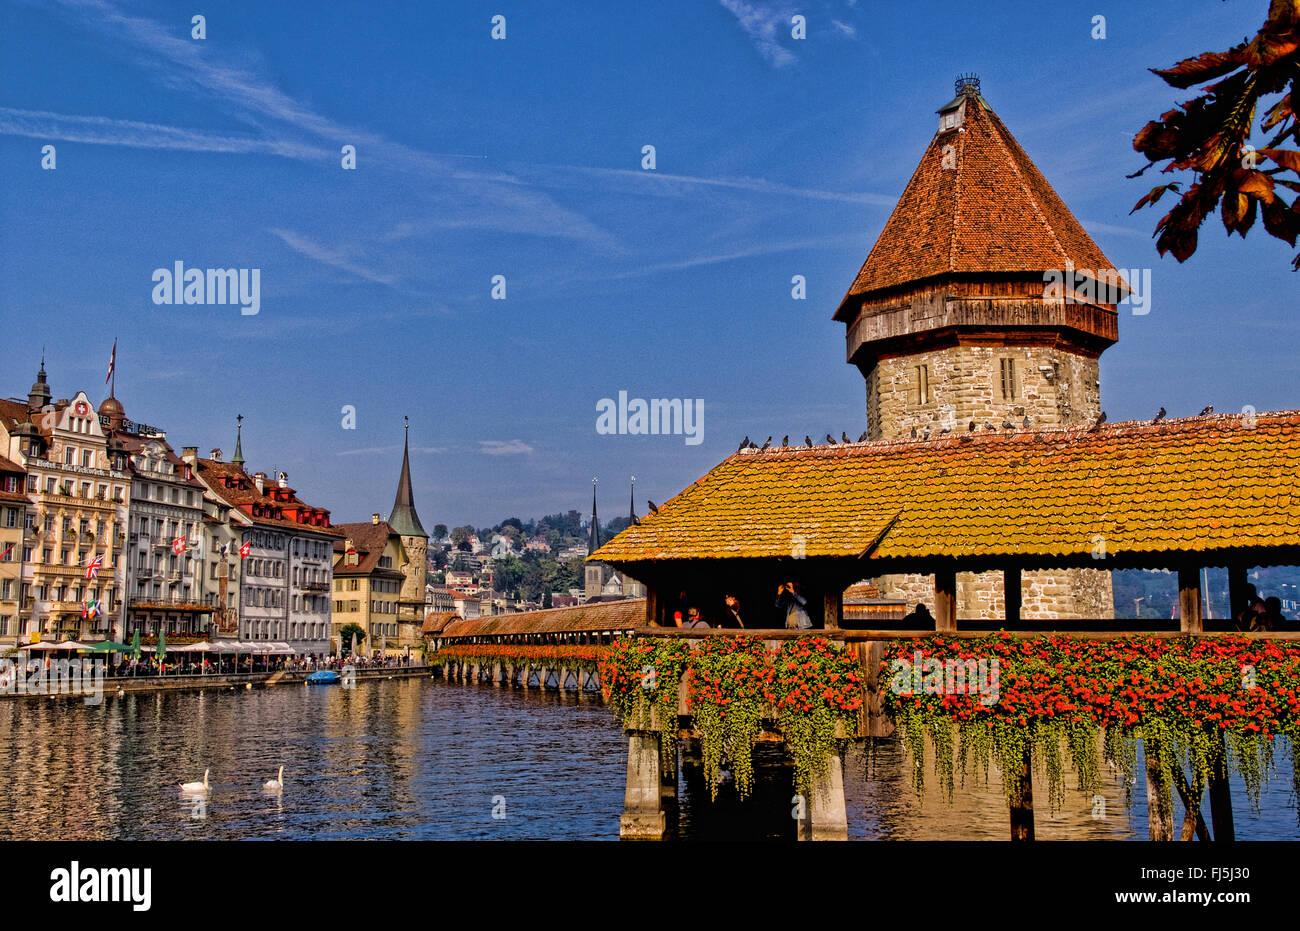 Kapelbrucke Bridge called Chapel Bridge with swans at lake in Lucerne, Switzerland, Lucerne - Stock Image